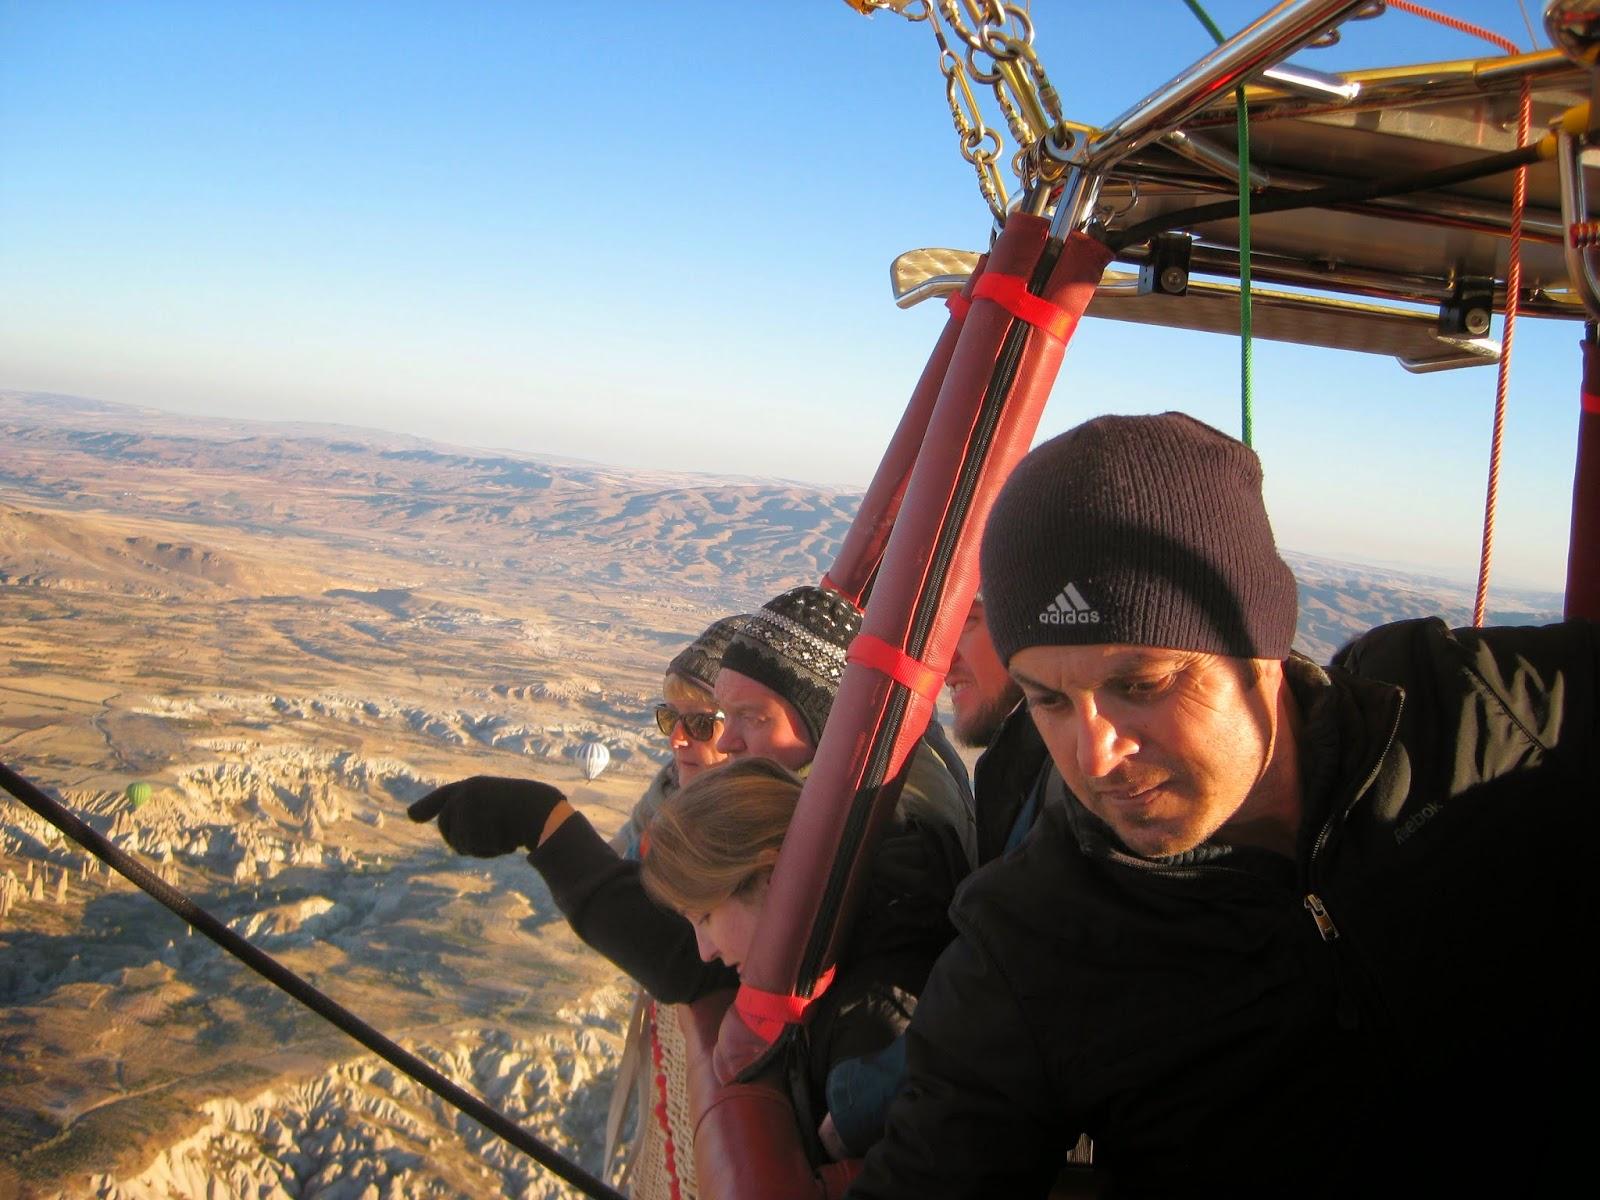 Cappadocia - Our pilot keeps us on course